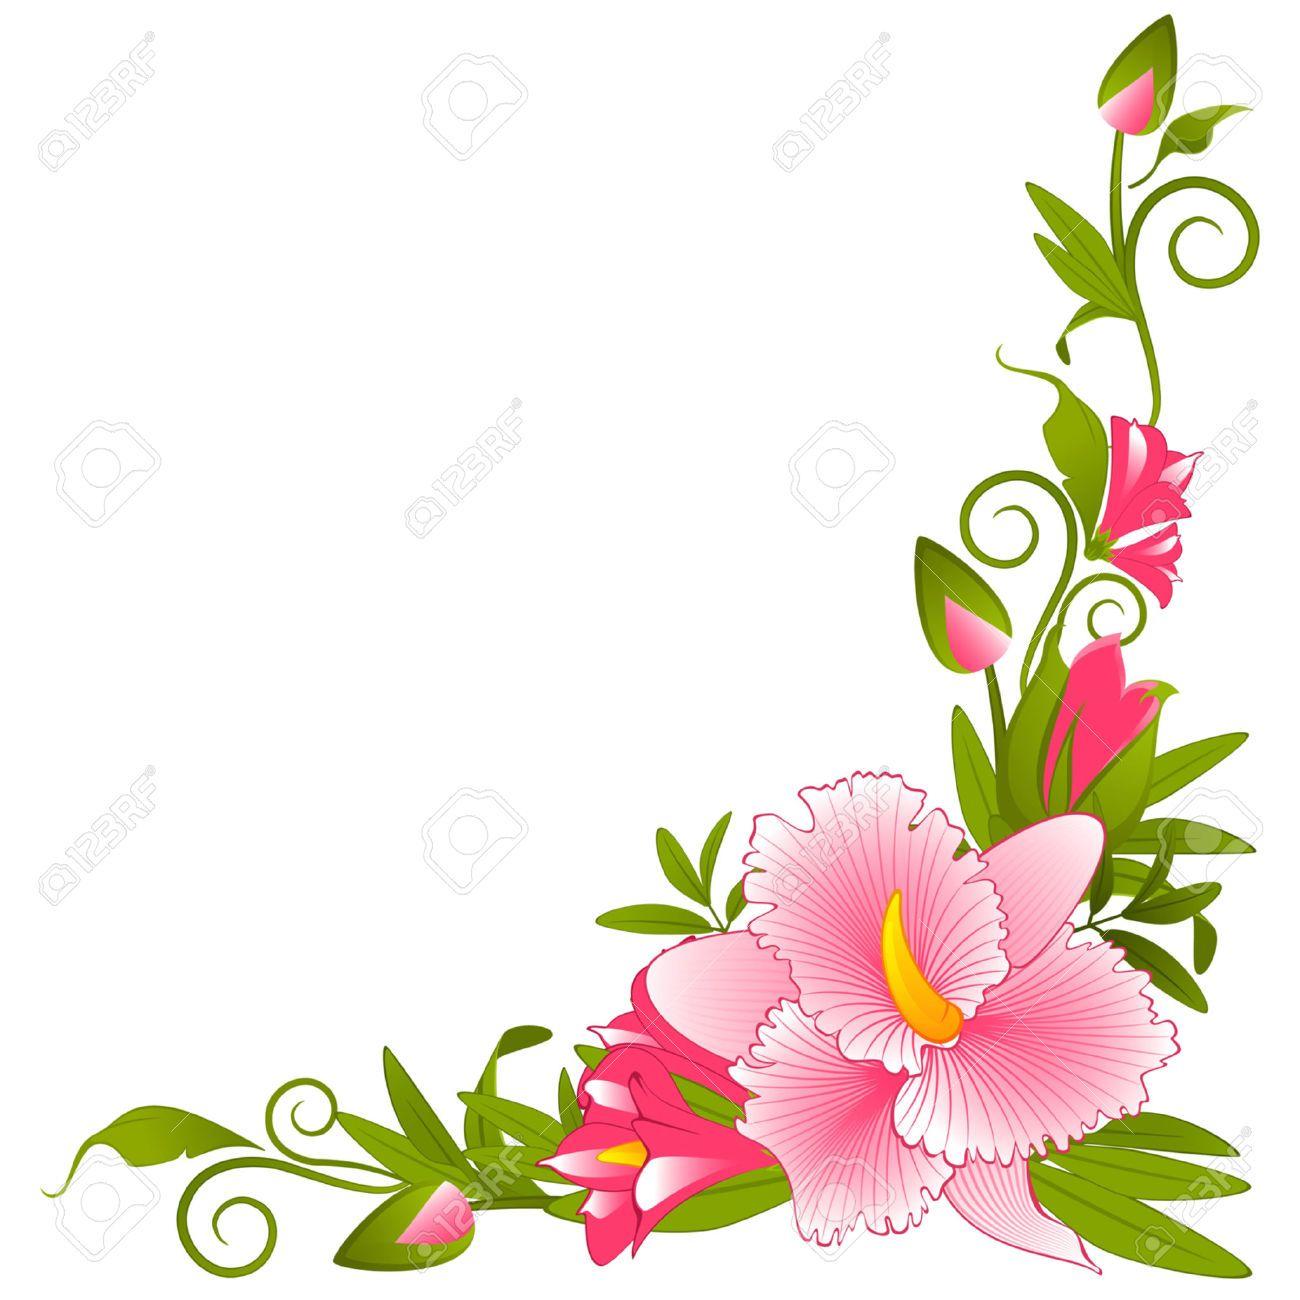 Nurcan Cuceoglu Bingkai Bunga Bunga Poster Bunga